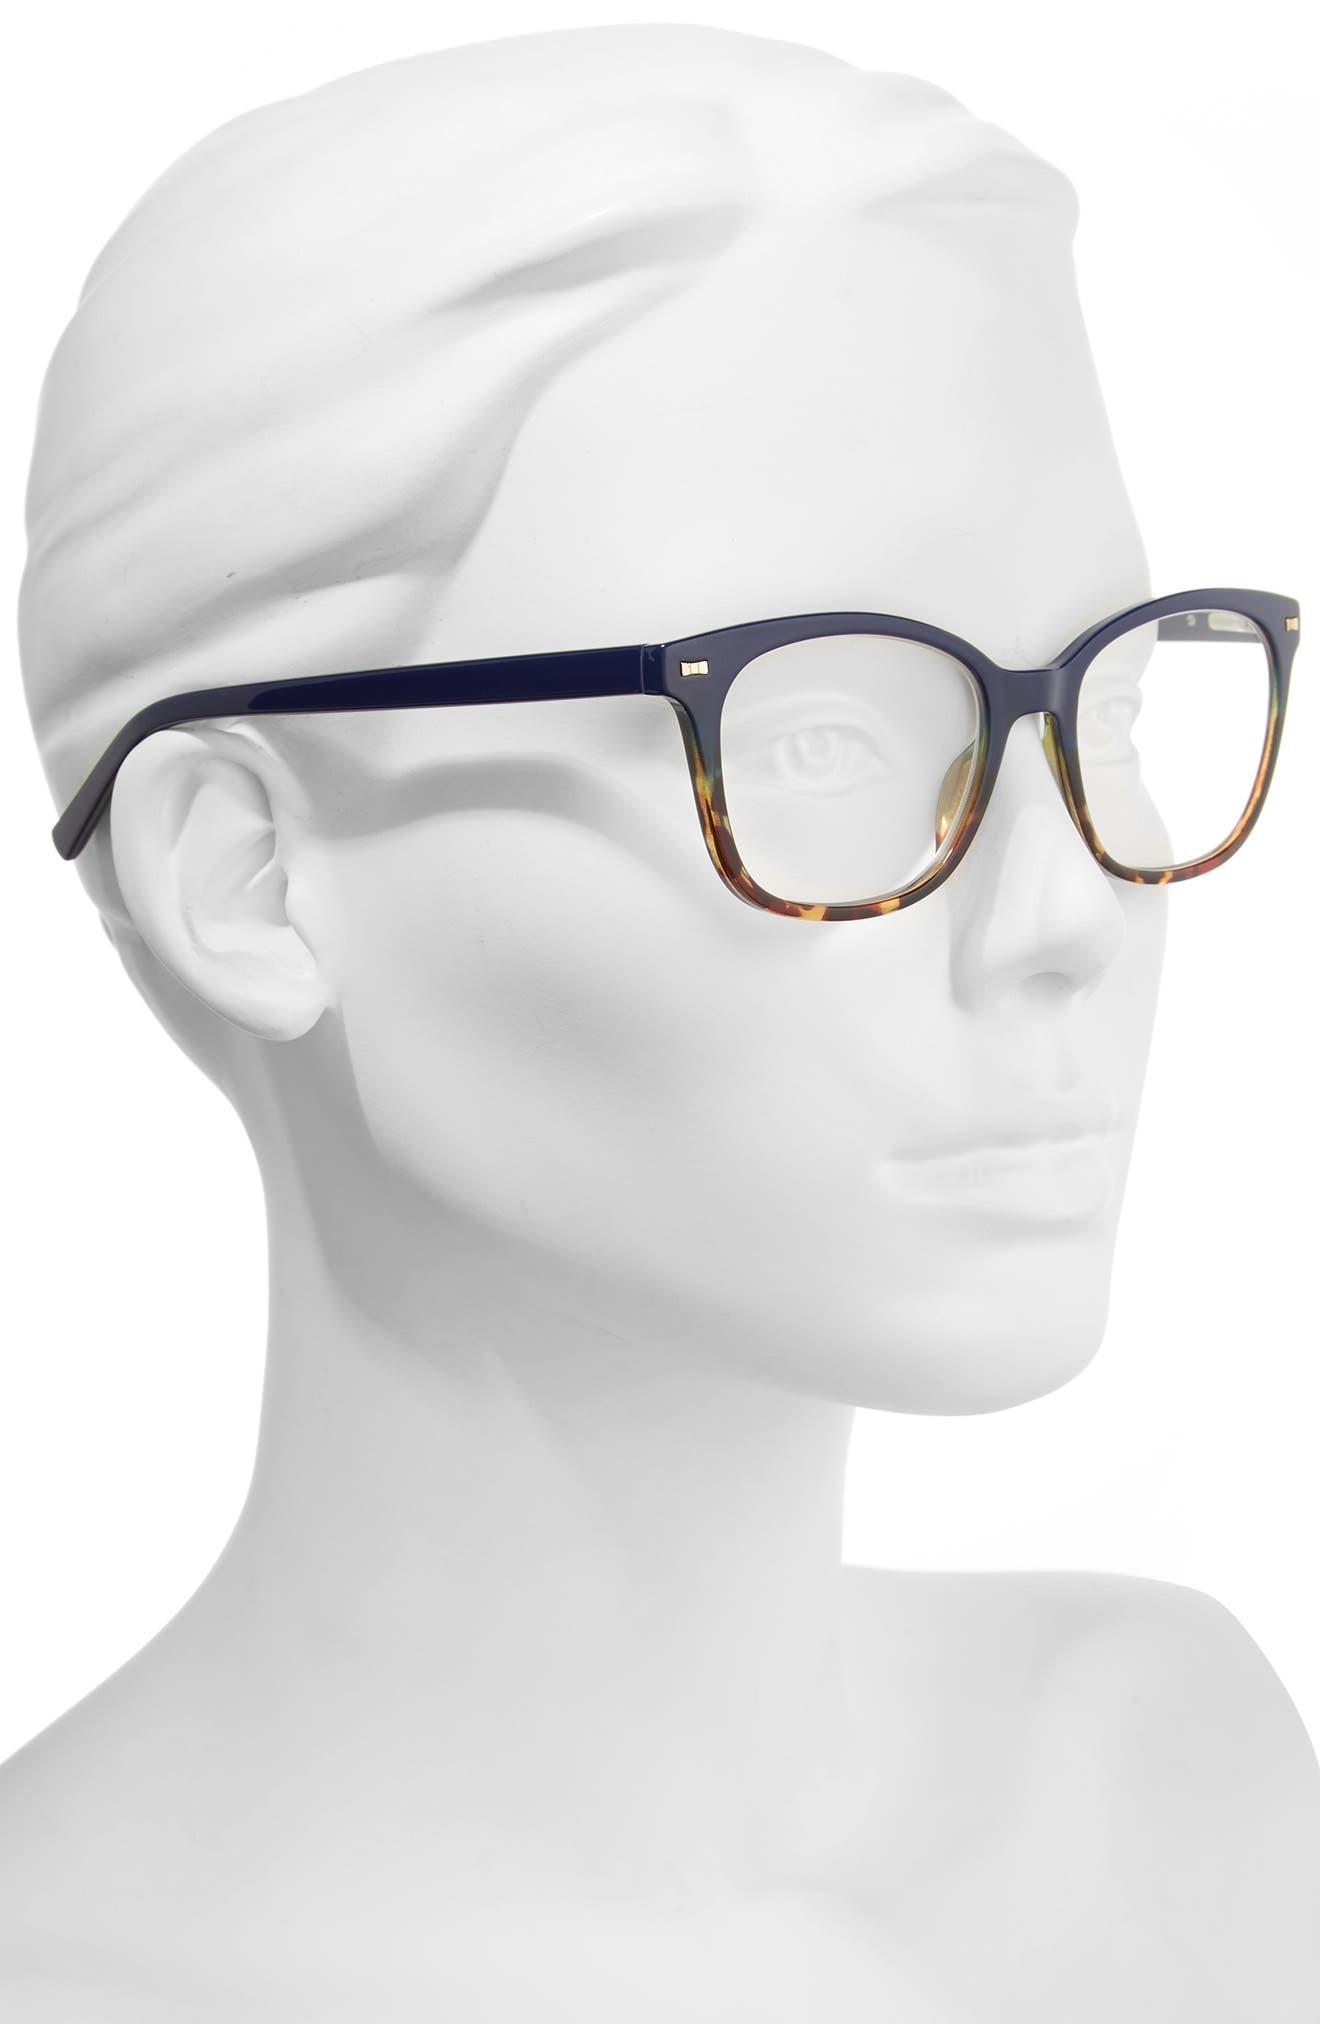 keadra 51mm reading glasses,                             Alternate thumbnail 2, color,                             Blue Havana